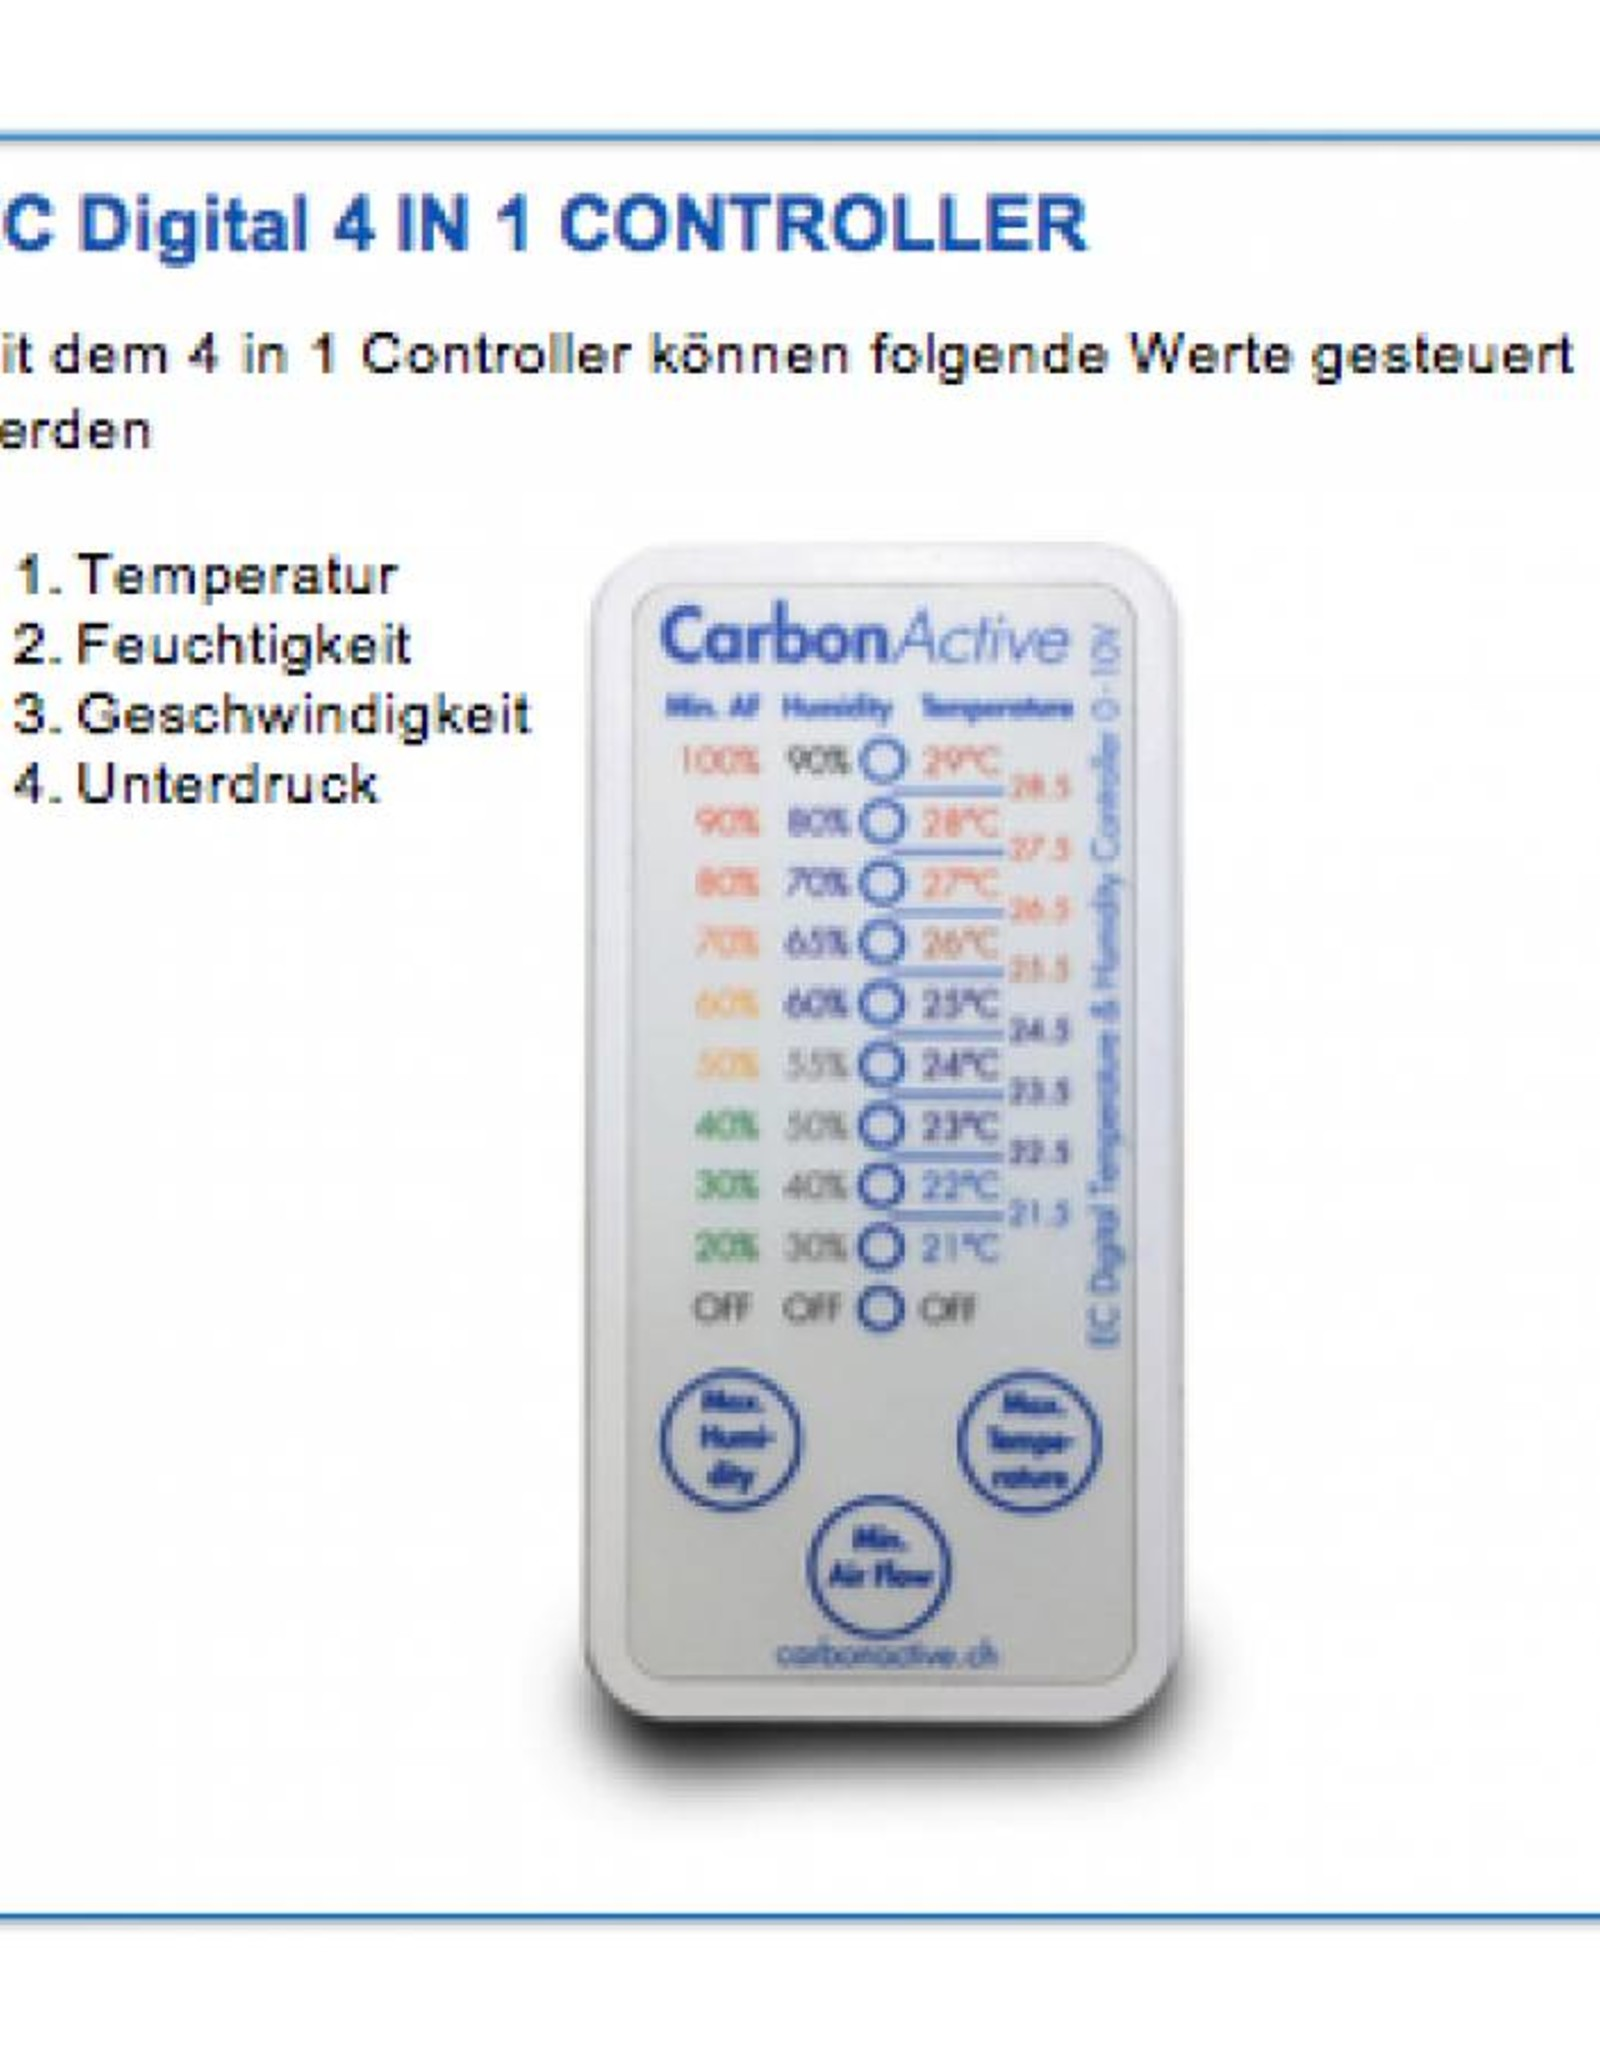 Carbon Active Carbon Active EC Digital 4 in 1 Controller